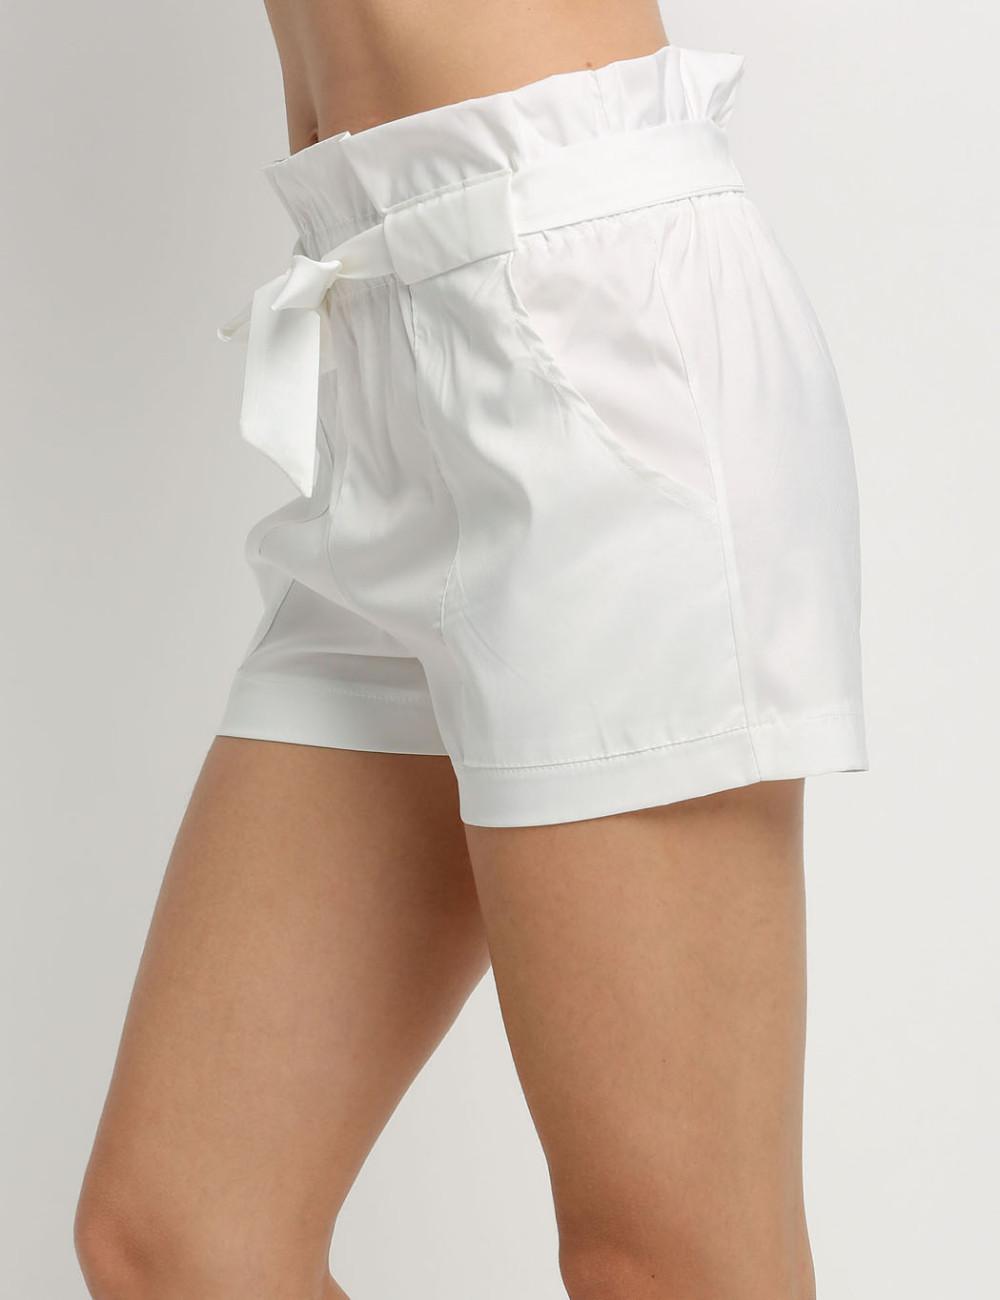 HTB1JIwkNFXXXXbuapXXq6xXFXXXv - High Waist Shorts Loose Shorts With Belt Woman PTC 59